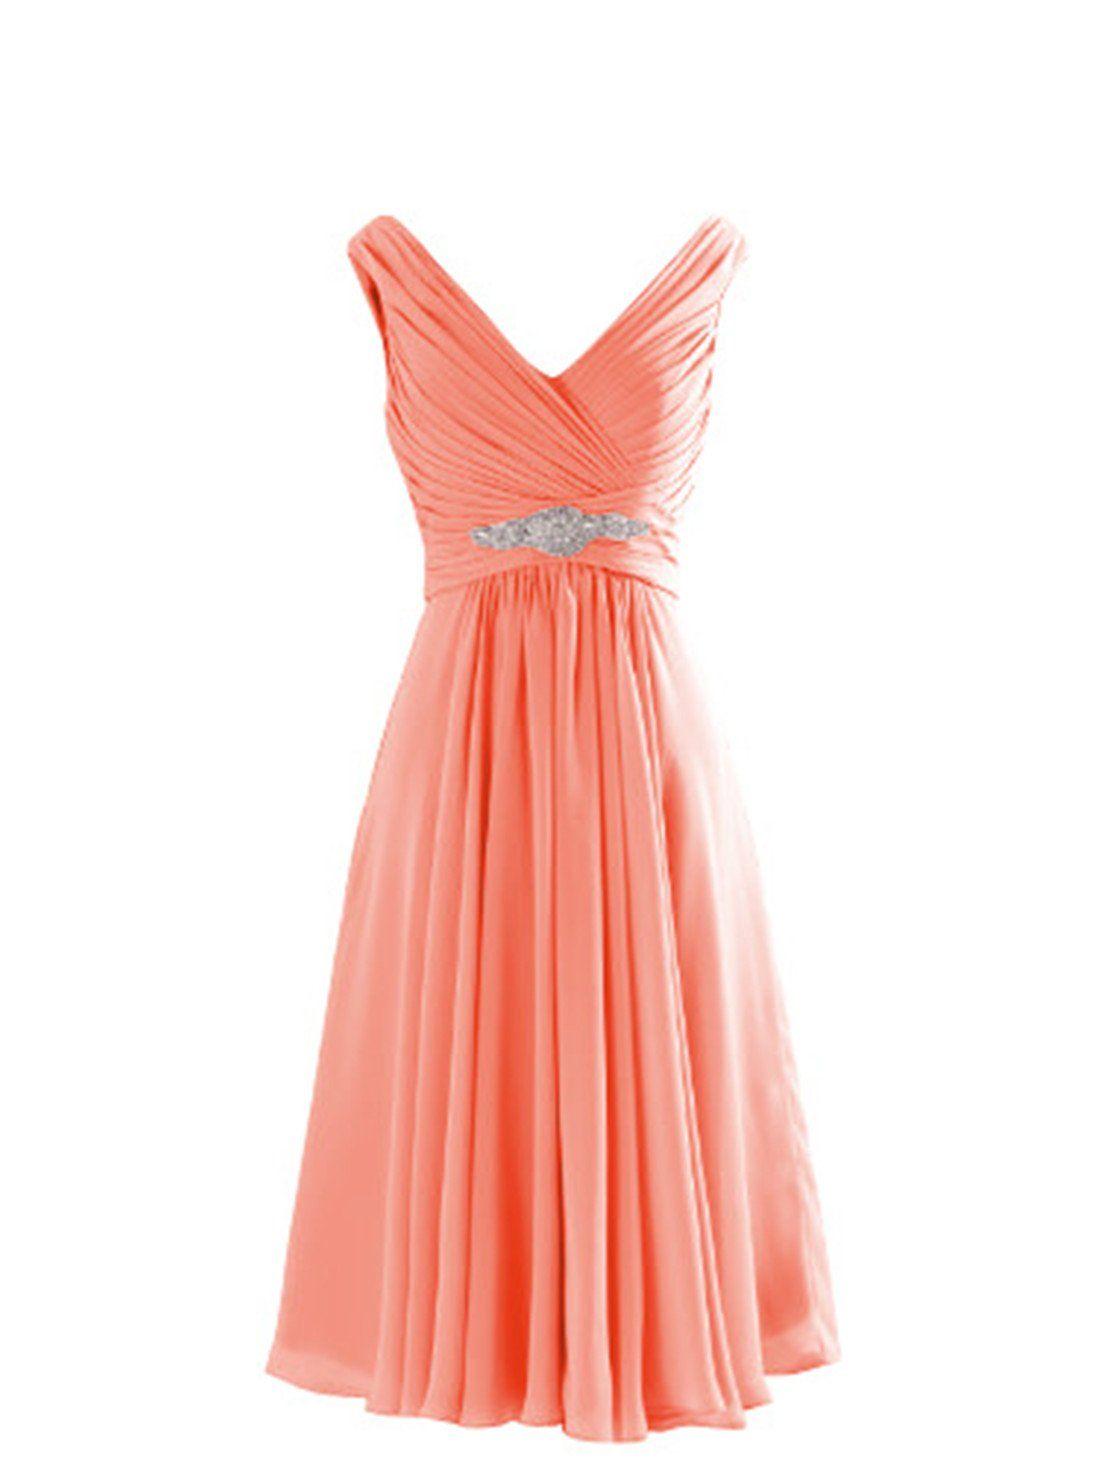 Yougao womenus v neck aline knee length chiffon dresses amazon